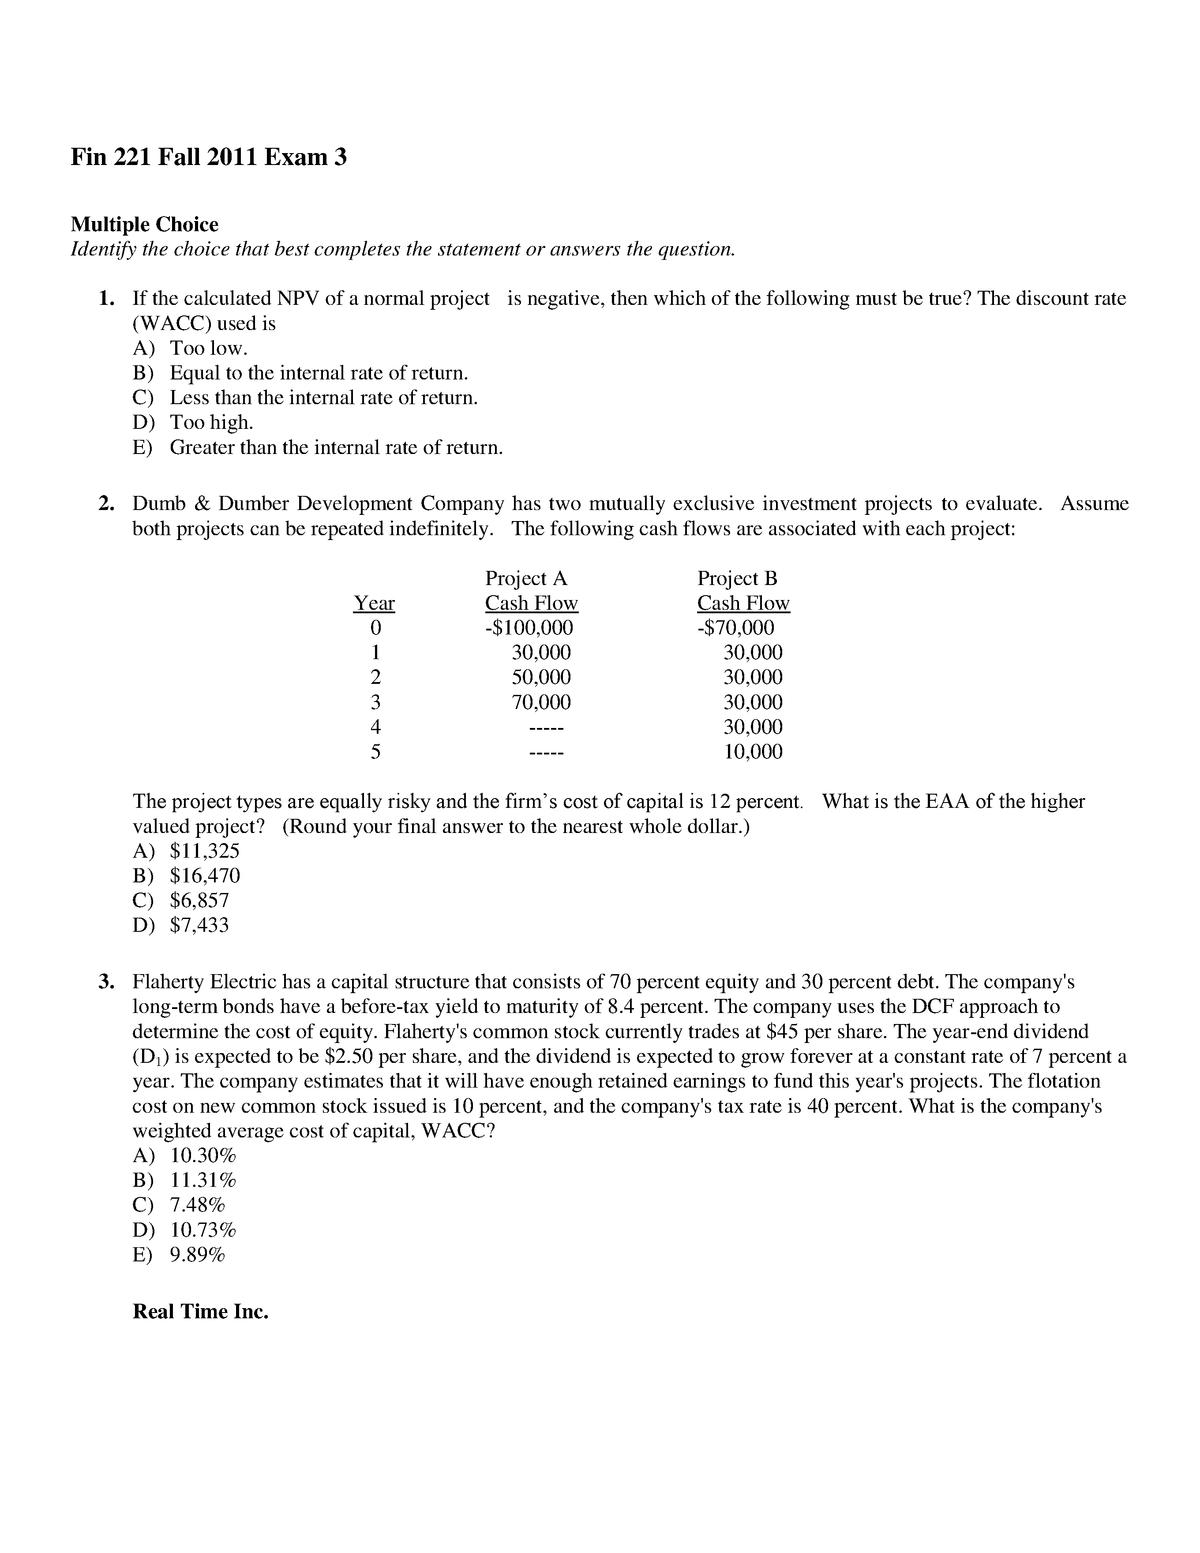 Exam 3 Fall 11 Corporate Finance Professor Dyer - FIN 221